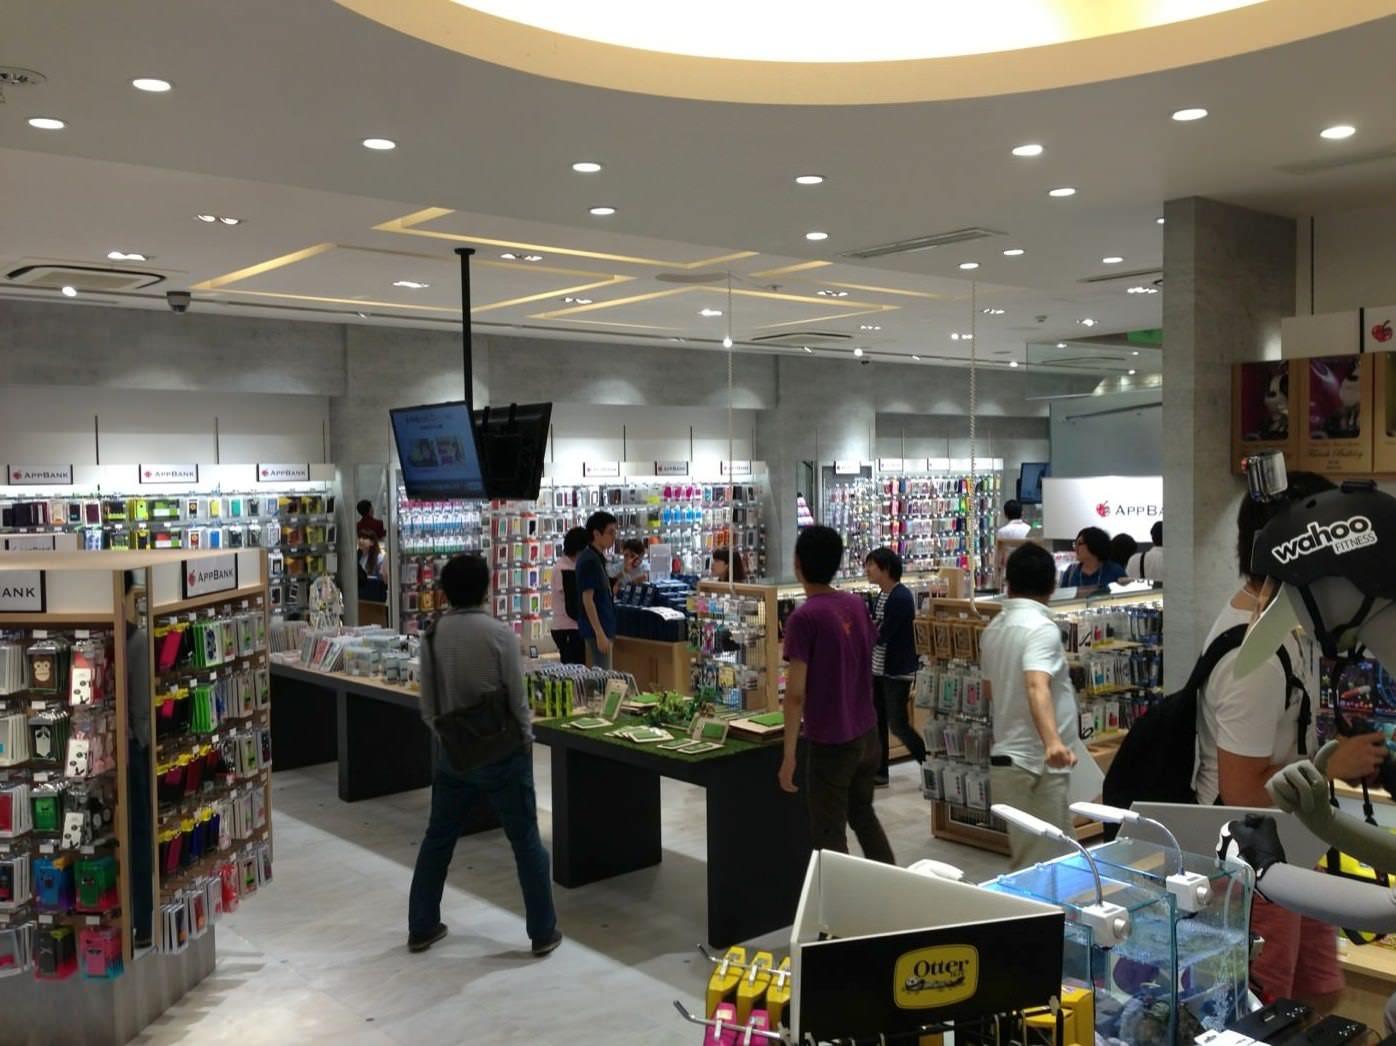 AppBank Store 新宿の店内はかなり広い!